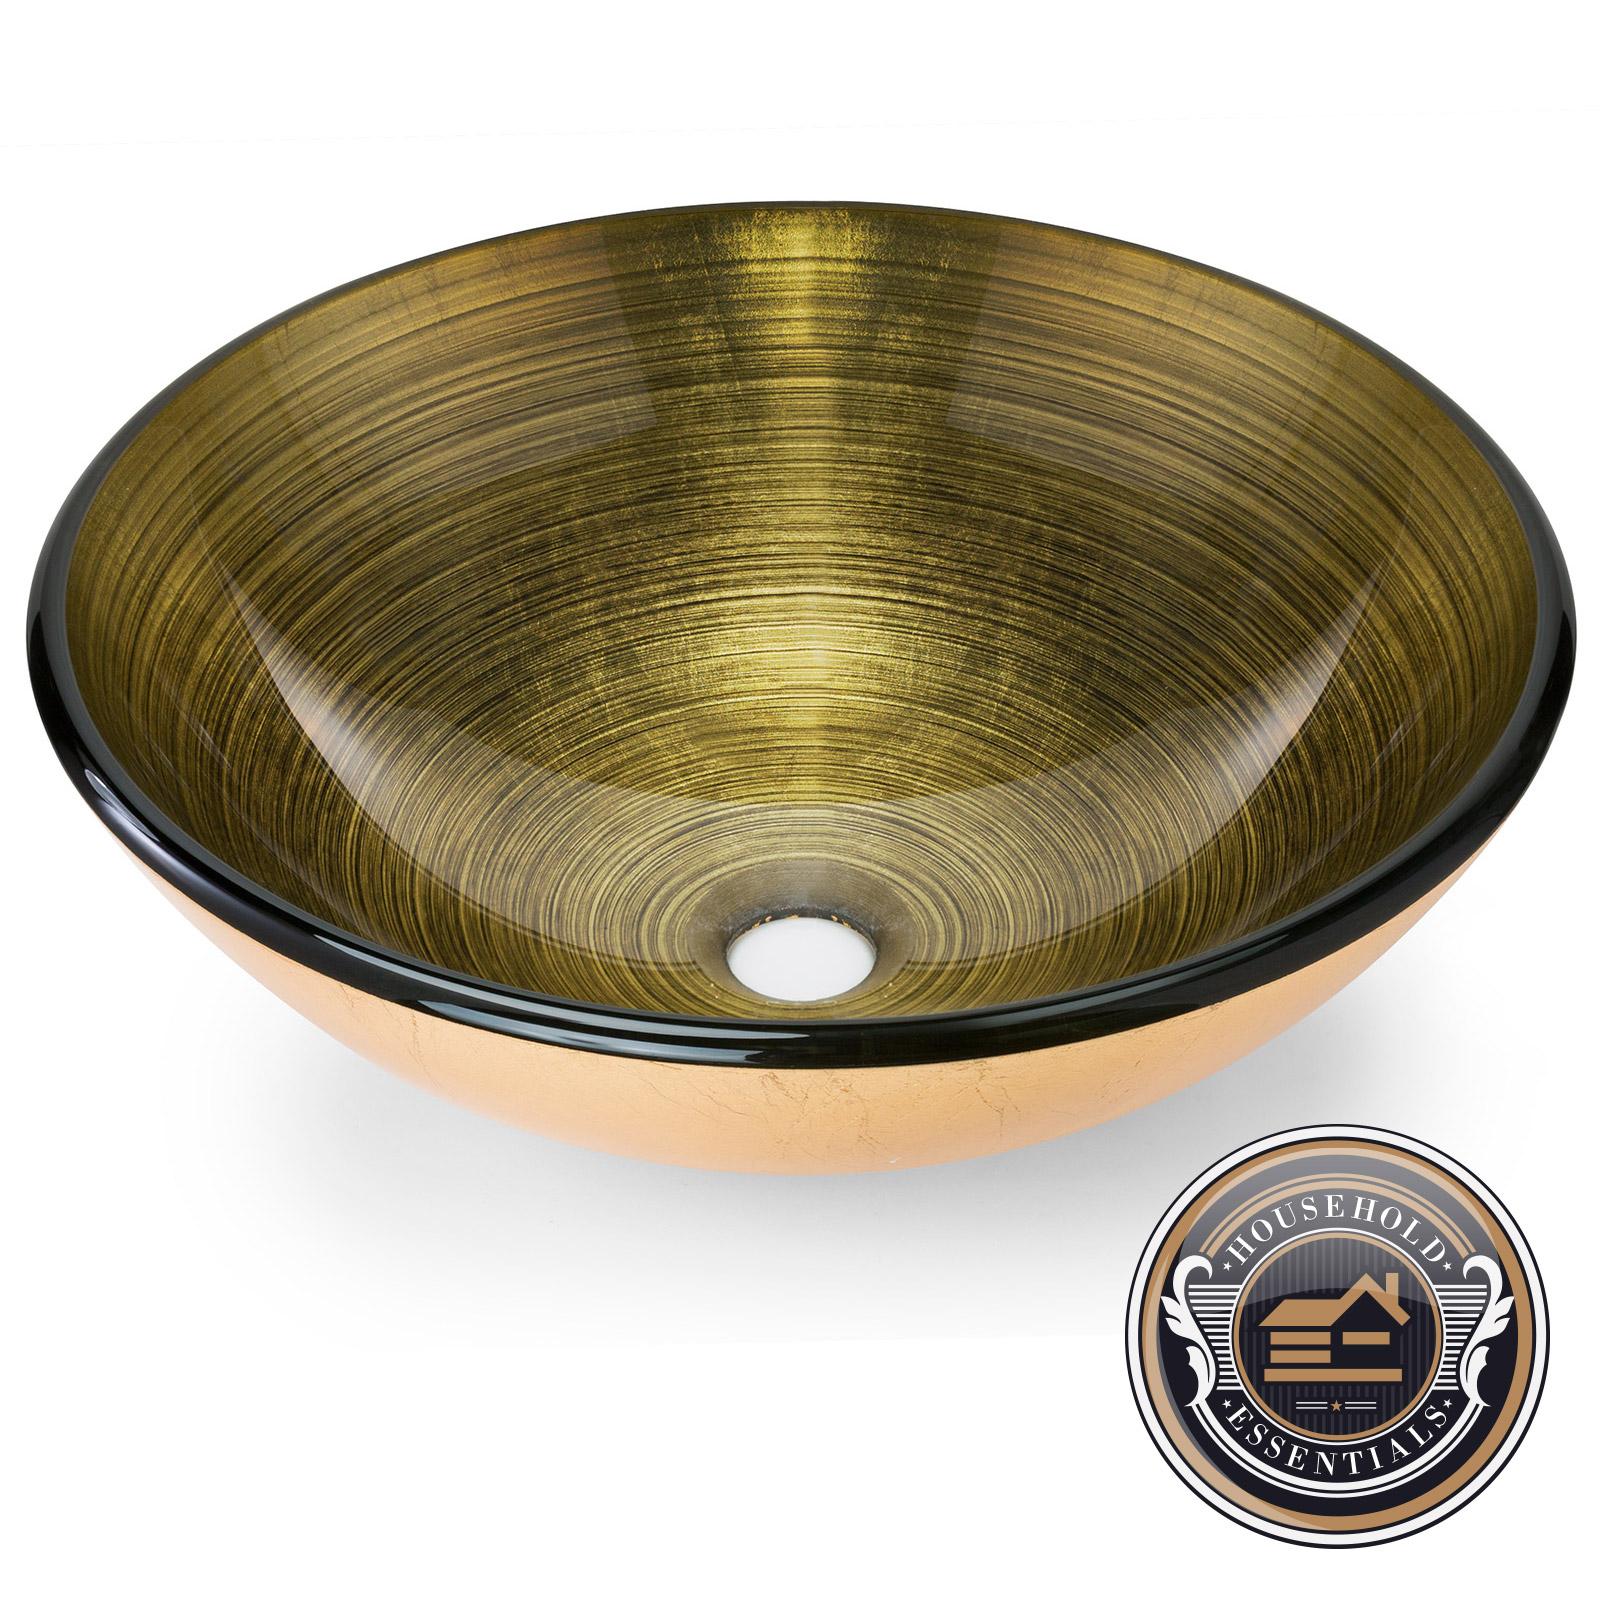 Gold Tempered Glass Vessel Sink Round Bathroom Bowl Vanity